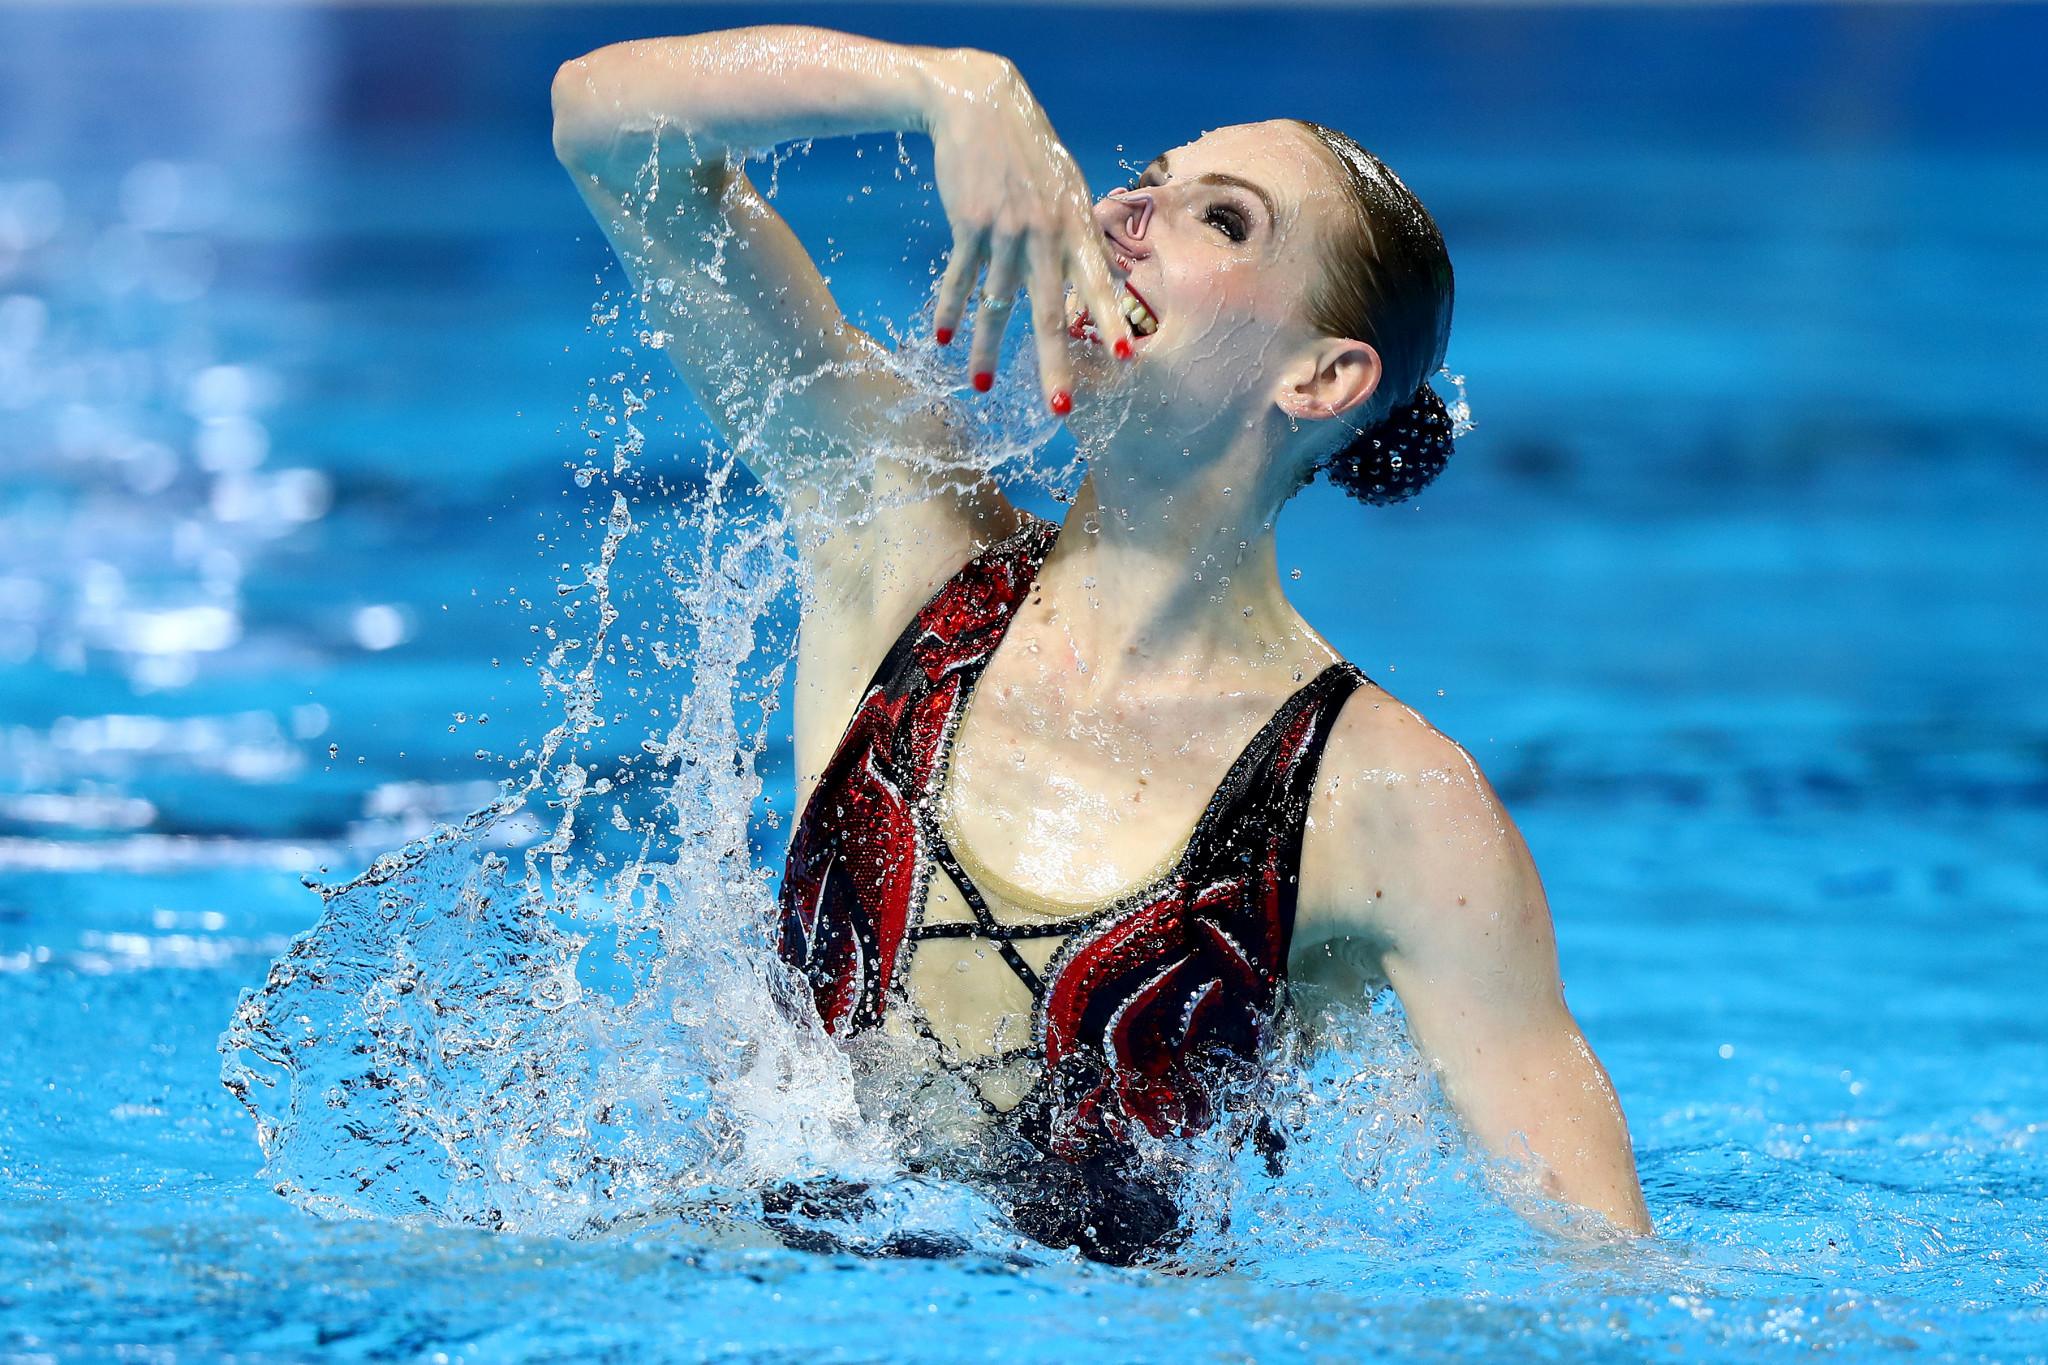 Olympic synchronised swimming champion Romashina hints at retirement before Tokyo 2020